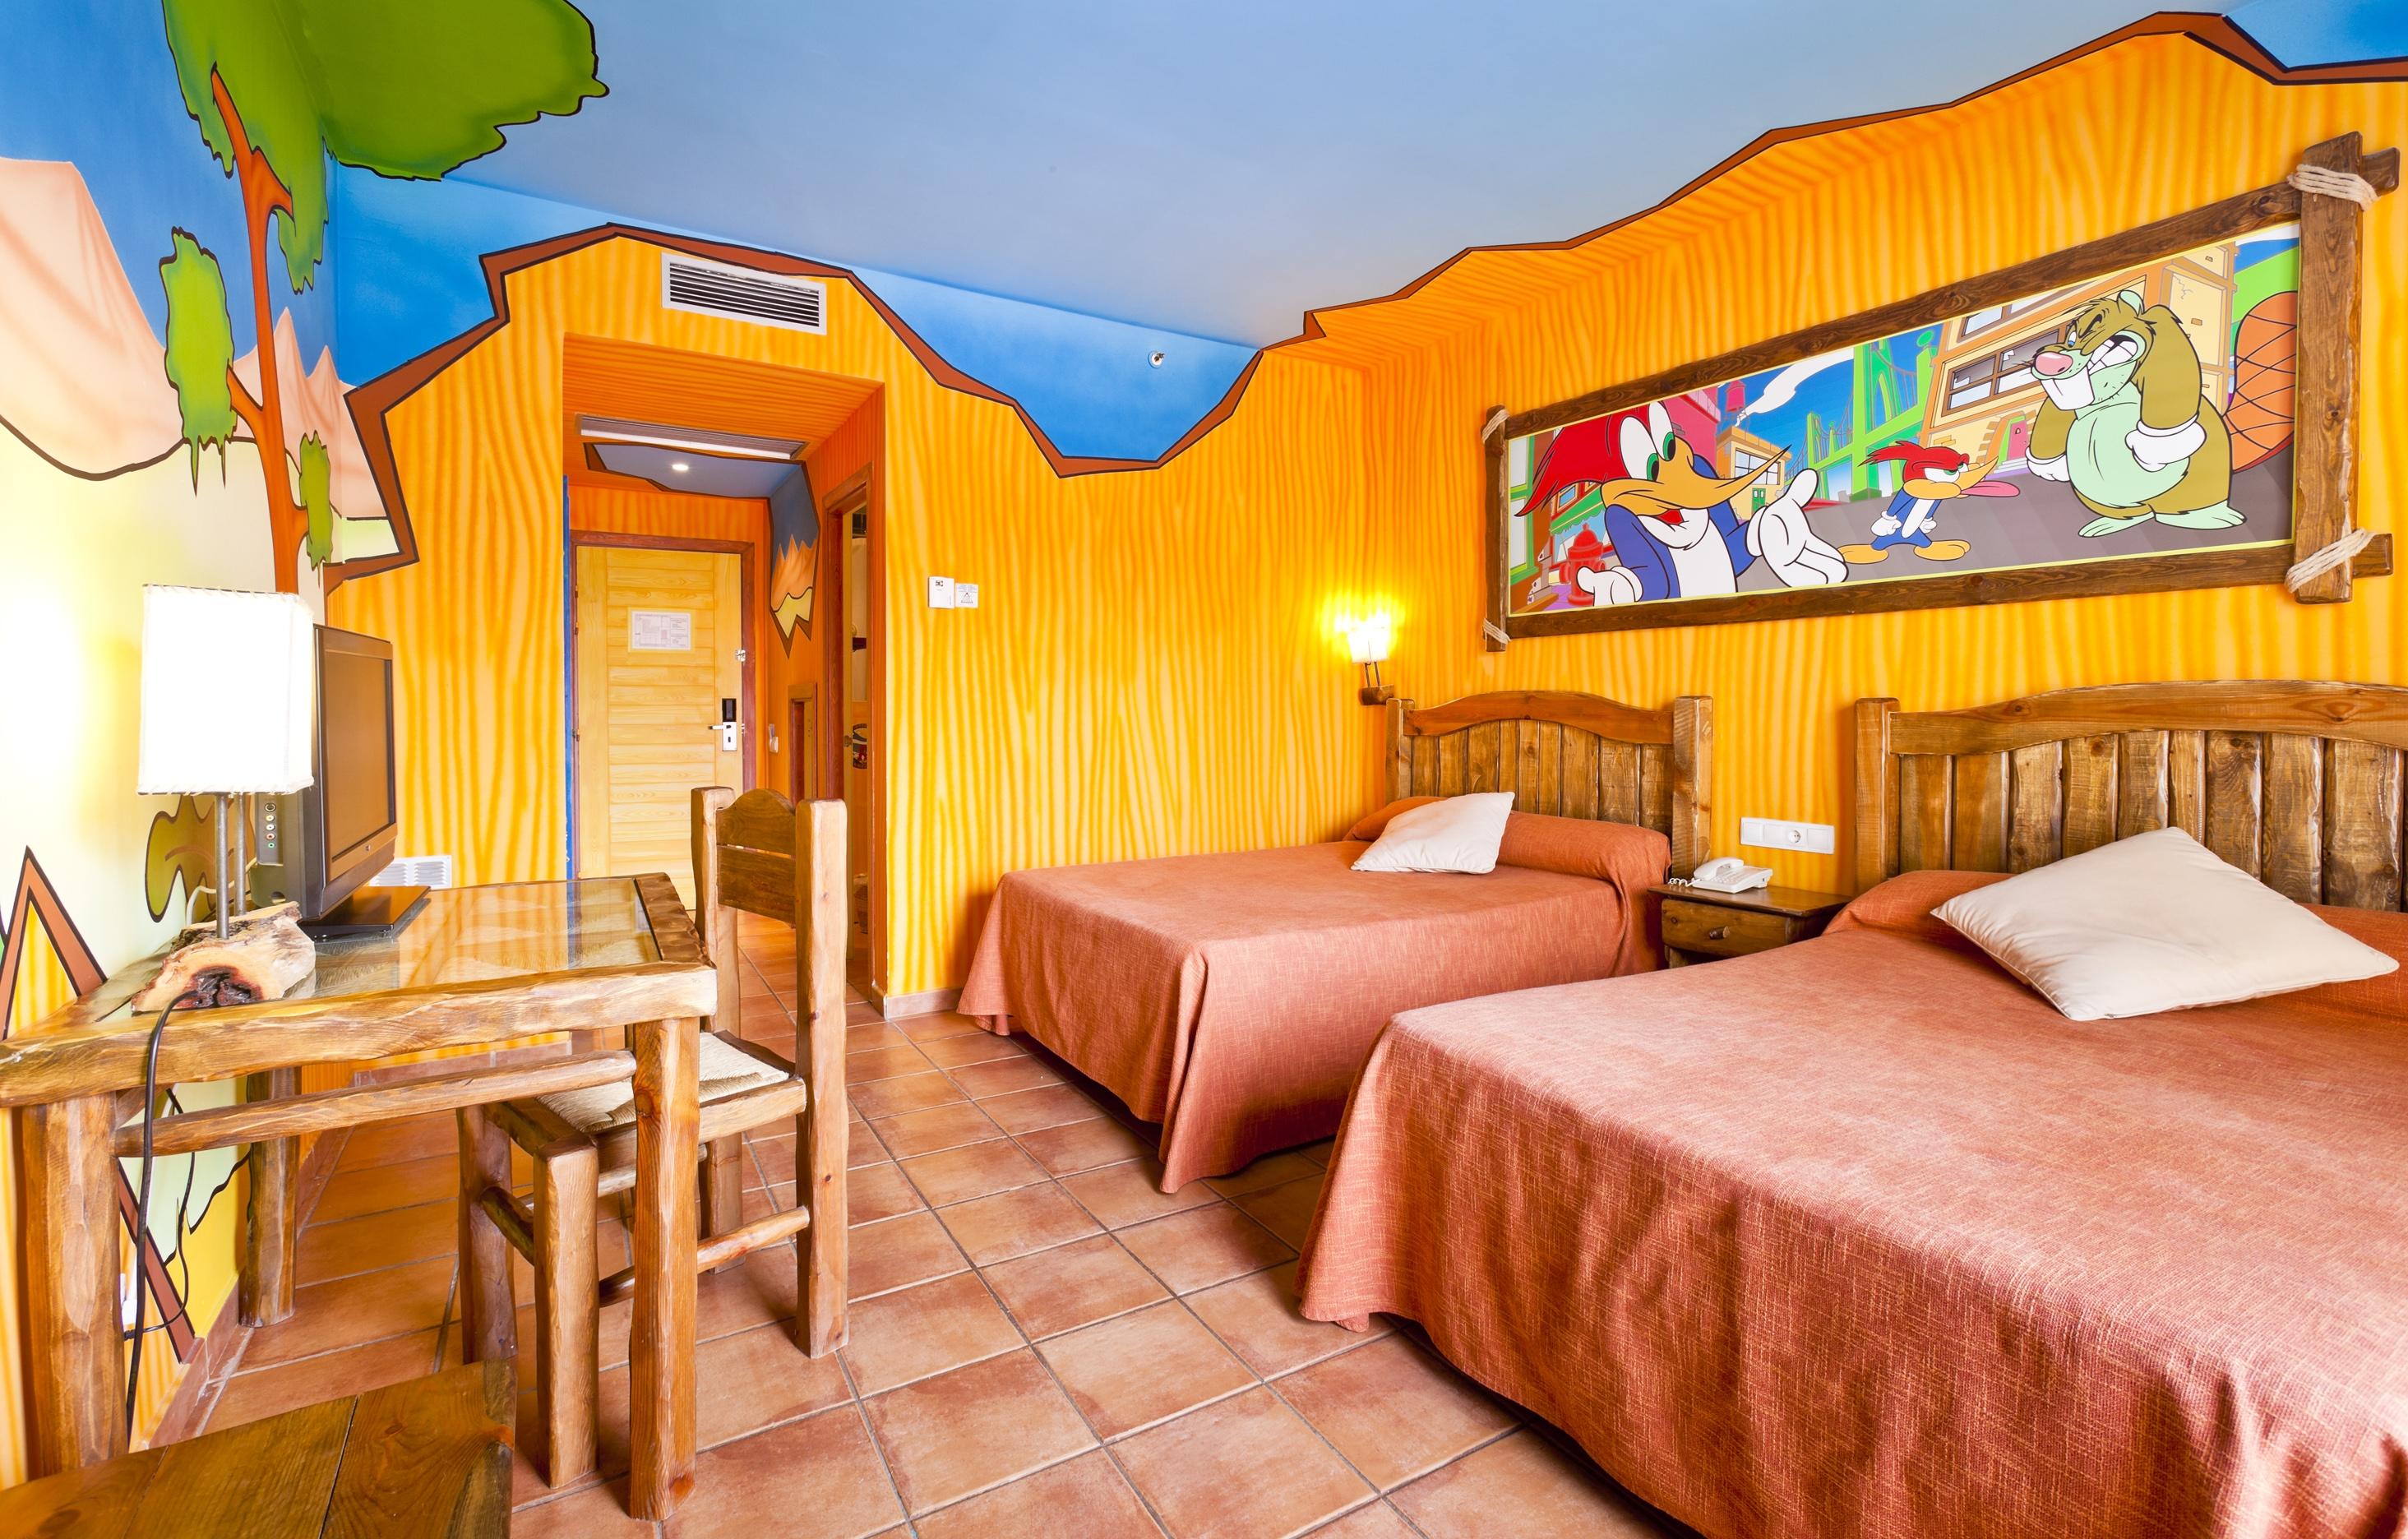 PortAventura Hôtel PortAventura, Portaventura à partir de 105€ - Logitravel